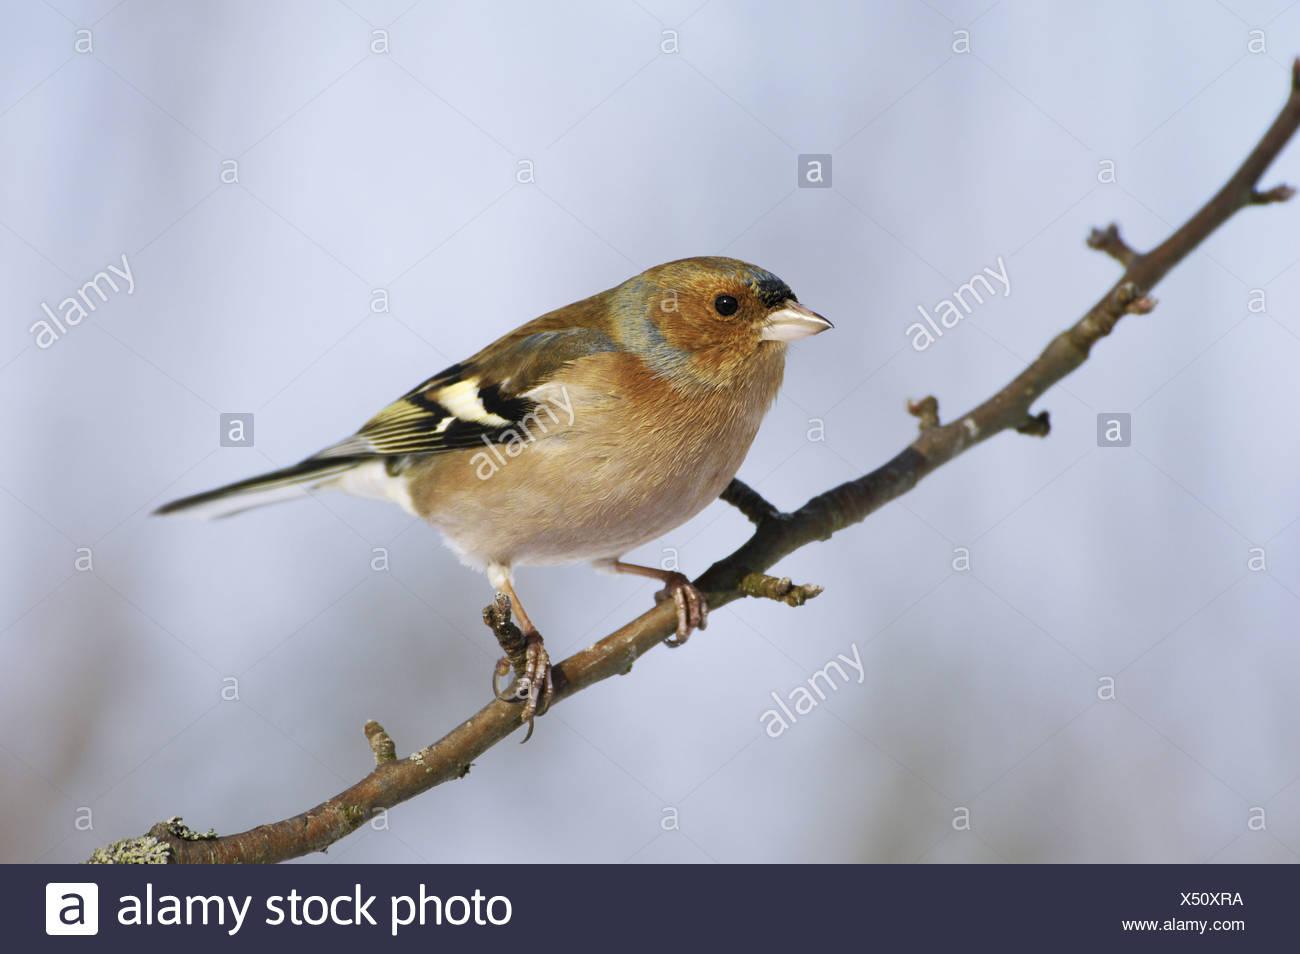 chaffinch on twig / Fringilla coelebs - Stock Image